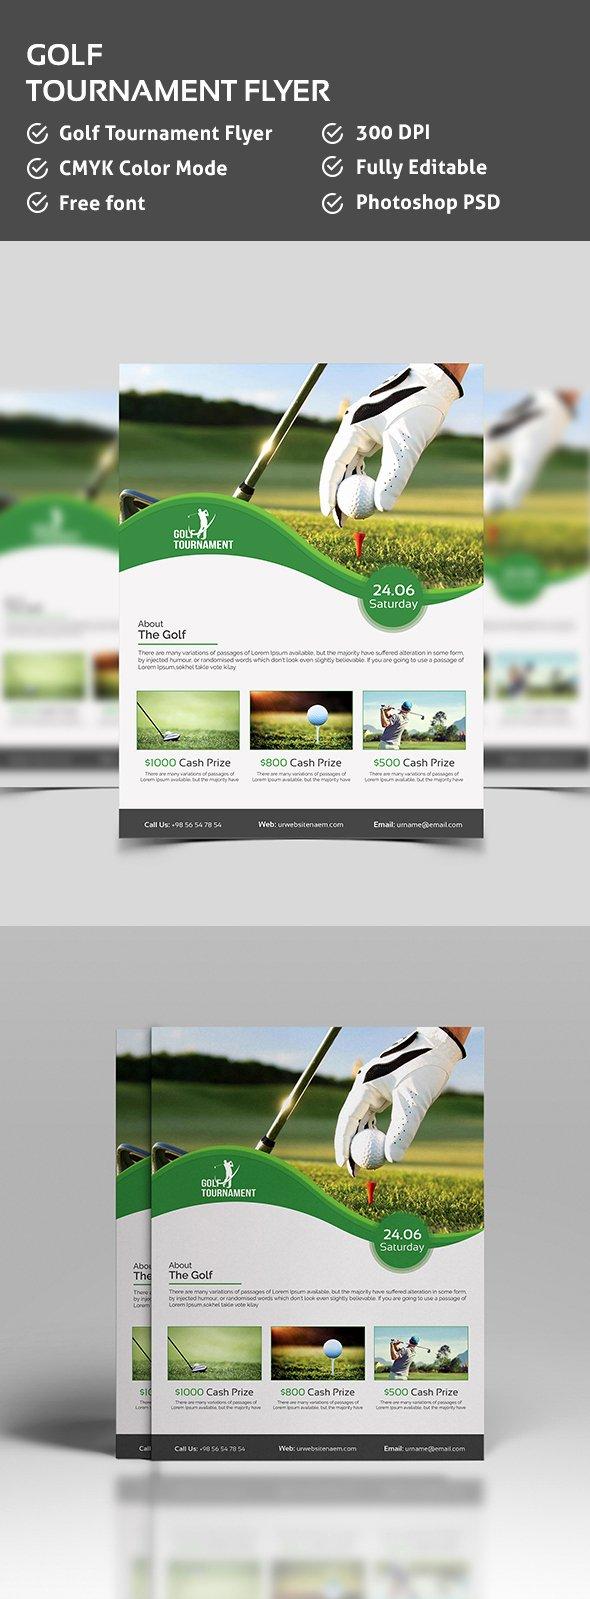 Golf Flyer Template Free Lovely Golf tournament Flyer